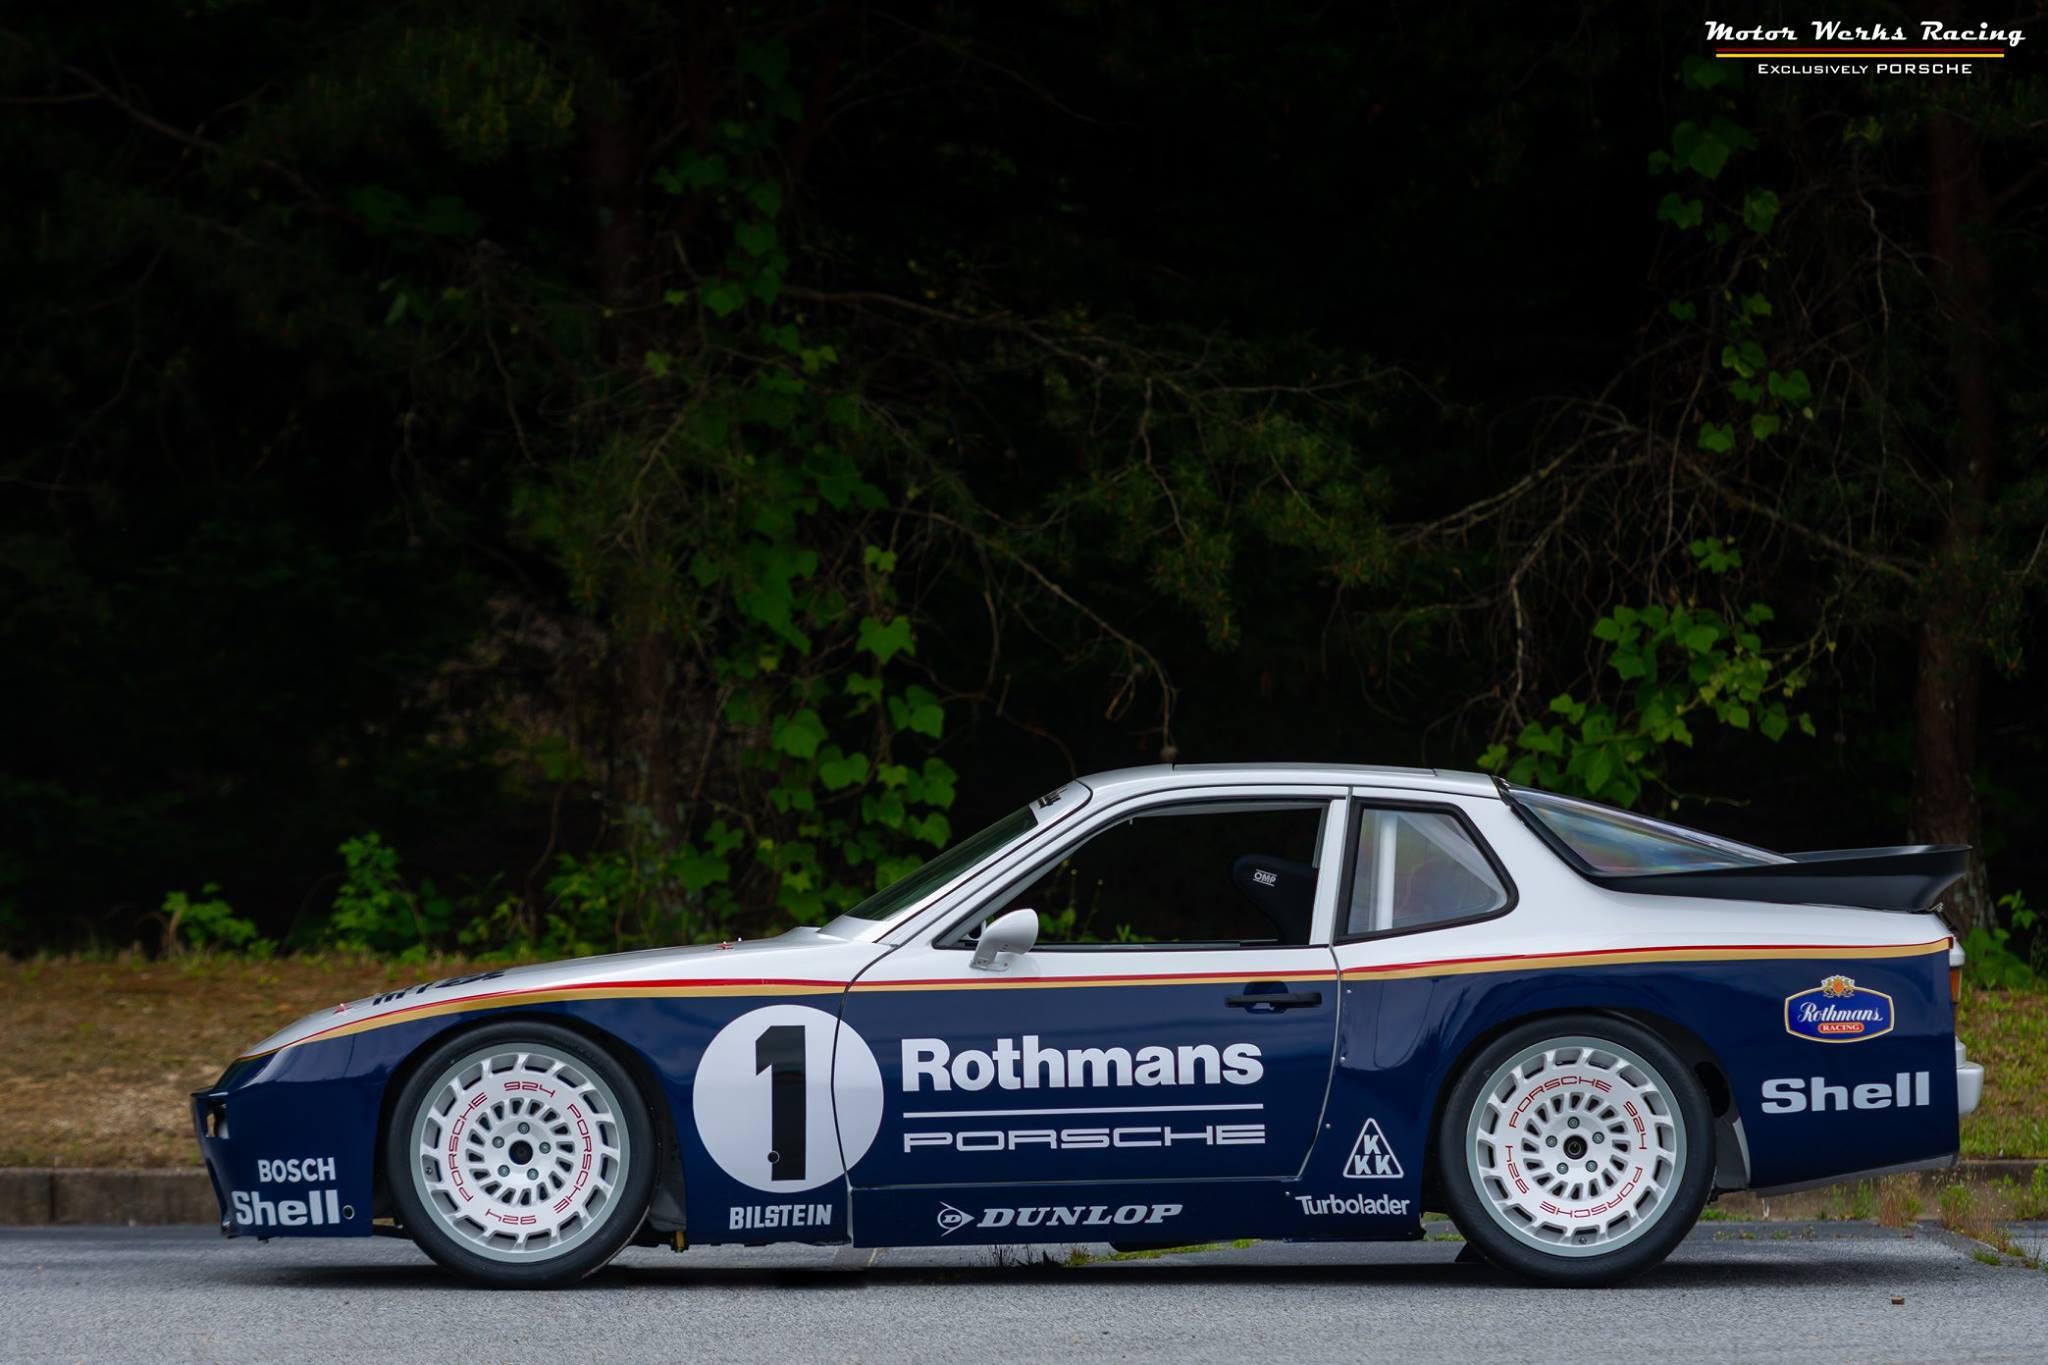 Porsche 924 with a turbo Audi 1.8 L inline-four